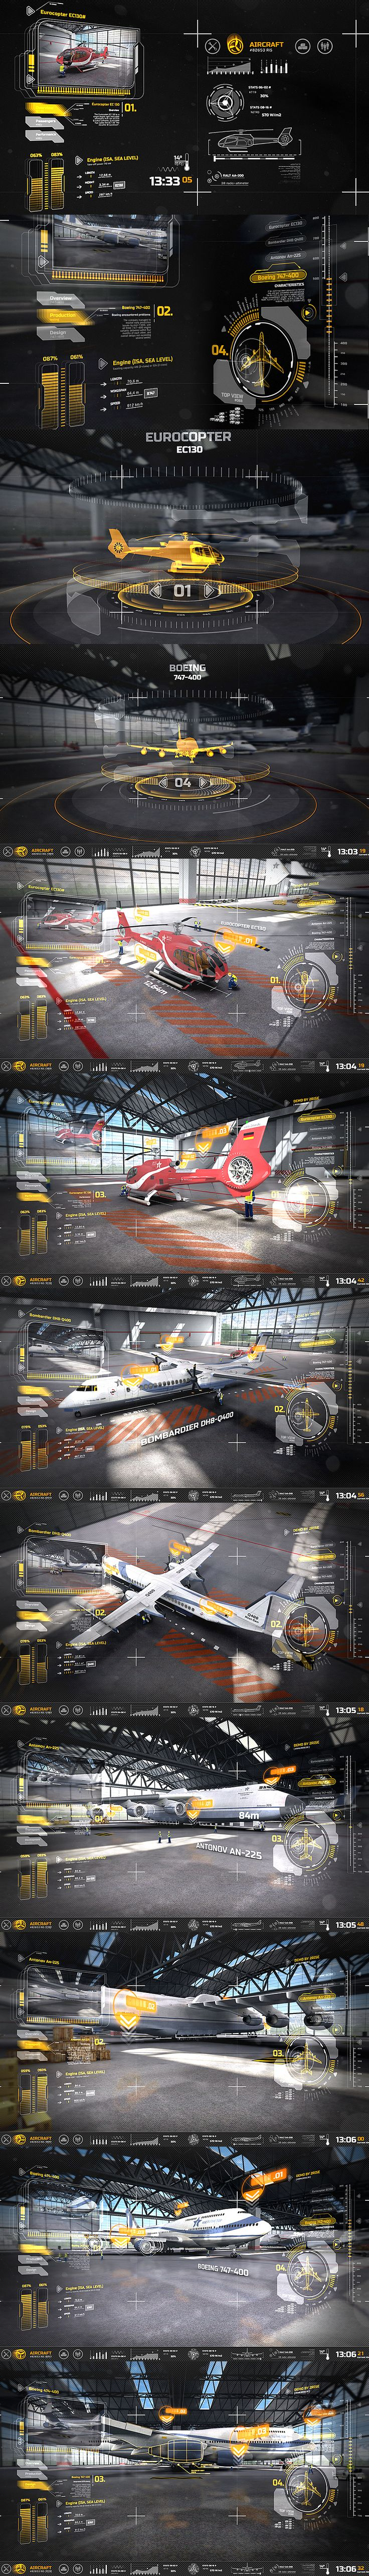 #2RISE VENTUZ AIRCRAFT DEMO by ~Jedi88 on deviantART